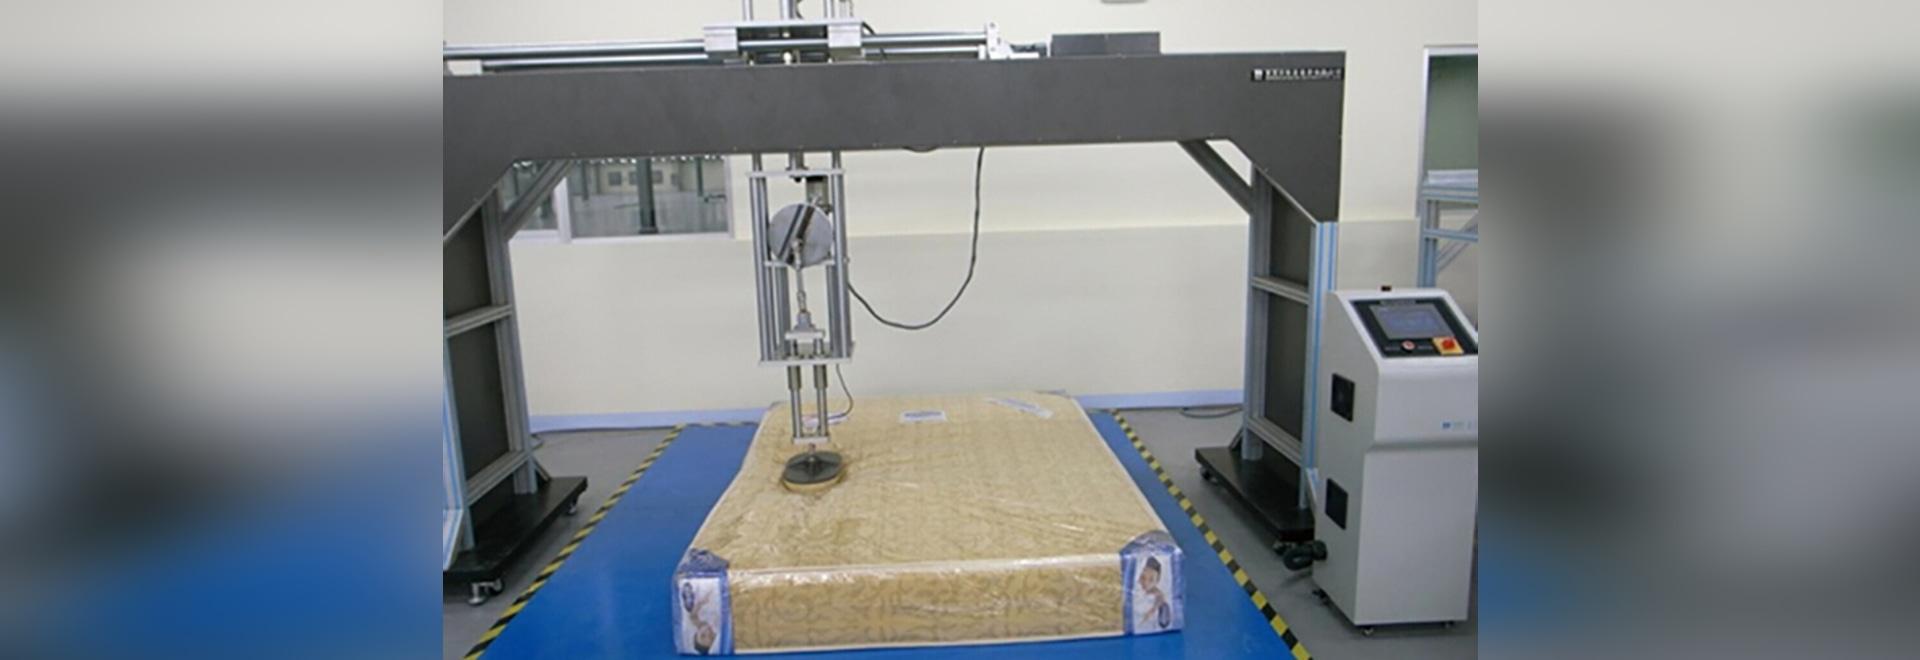 Machines de Cornell Mattress Durability Testing